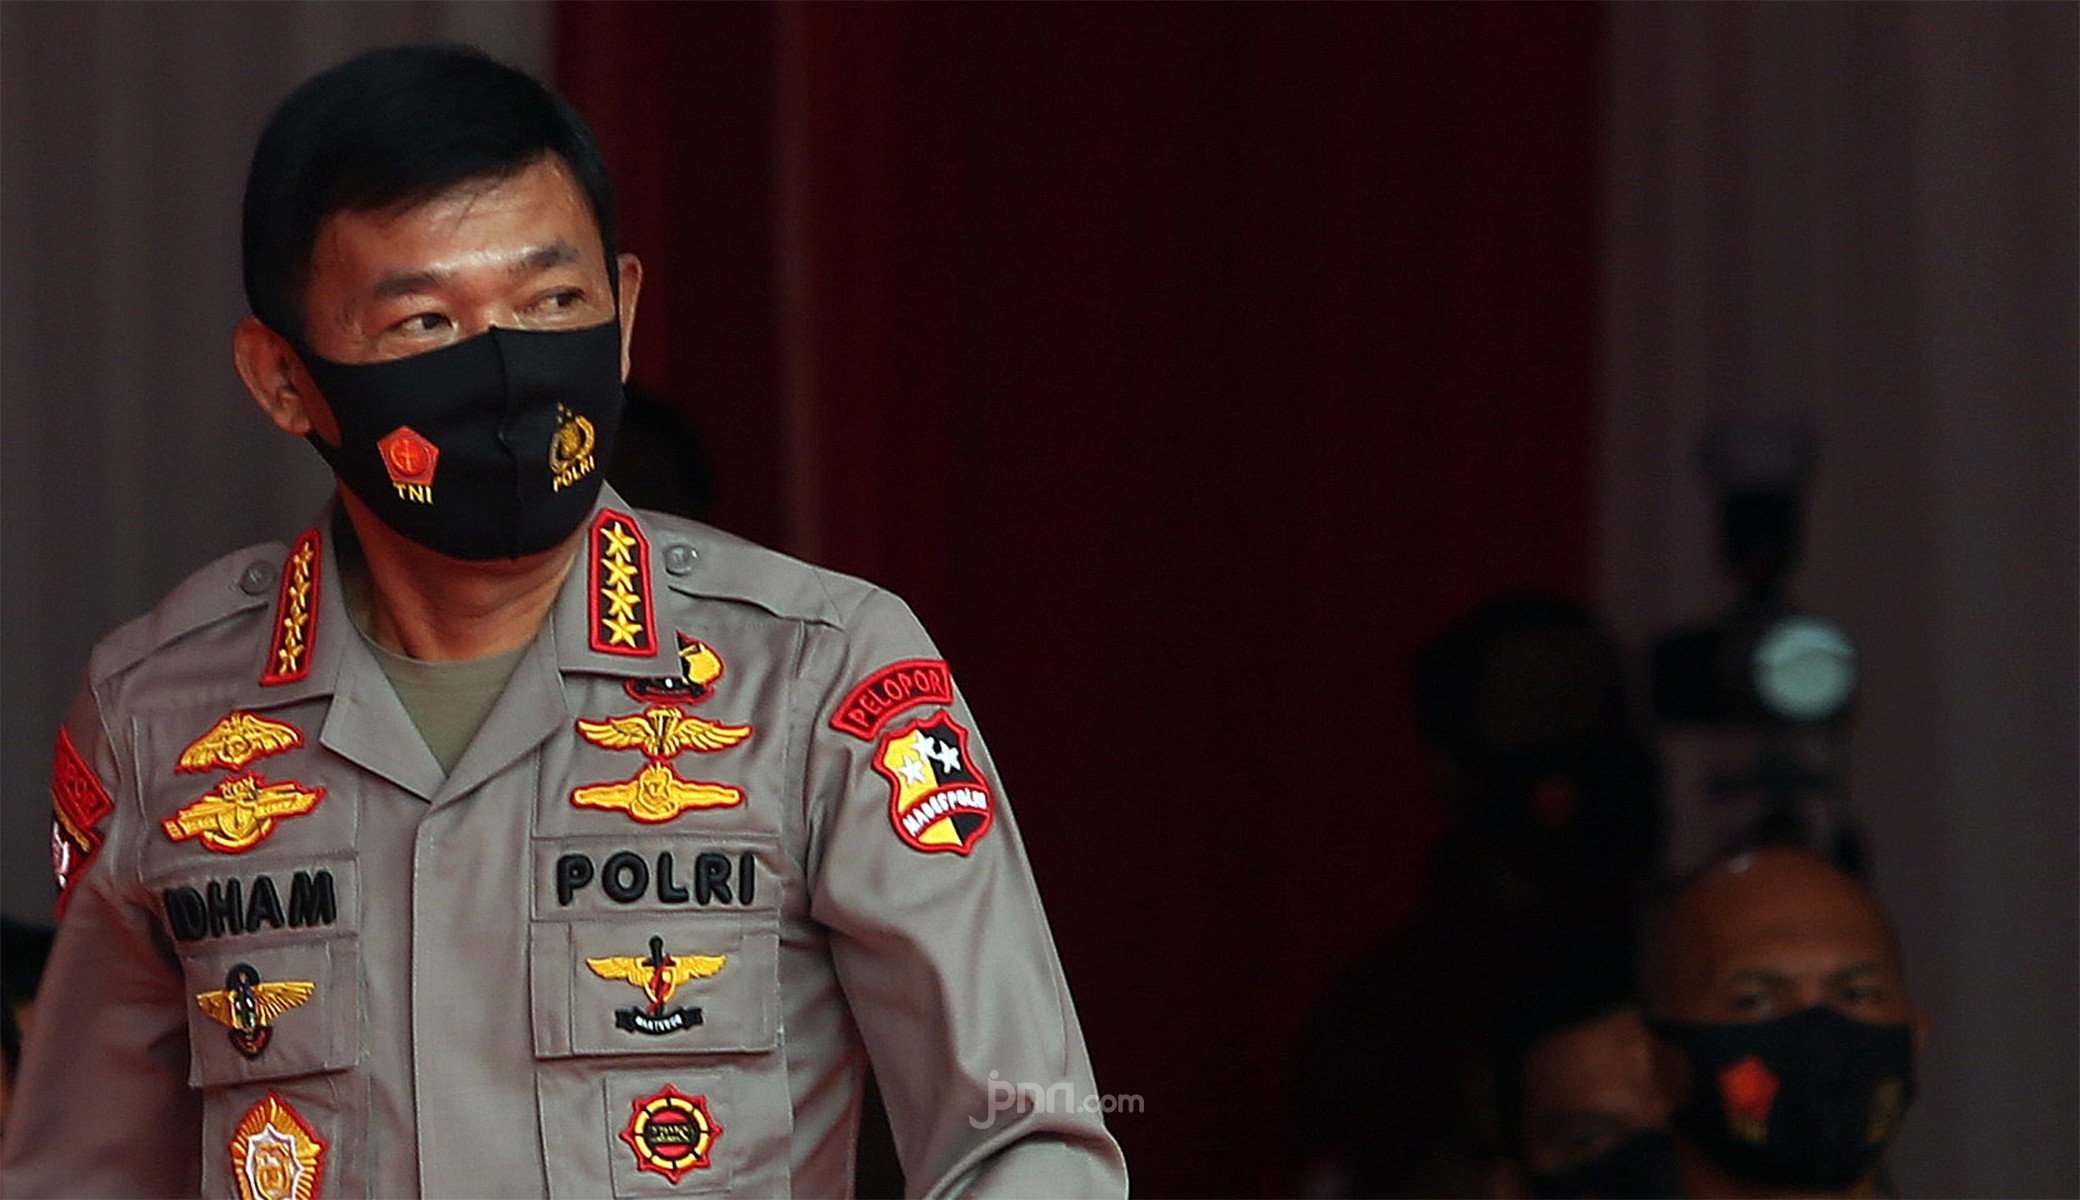 Jenderal Idham Azis Mengganti 4 Kapolres, Ini Daftar Namanya - JPNN.com